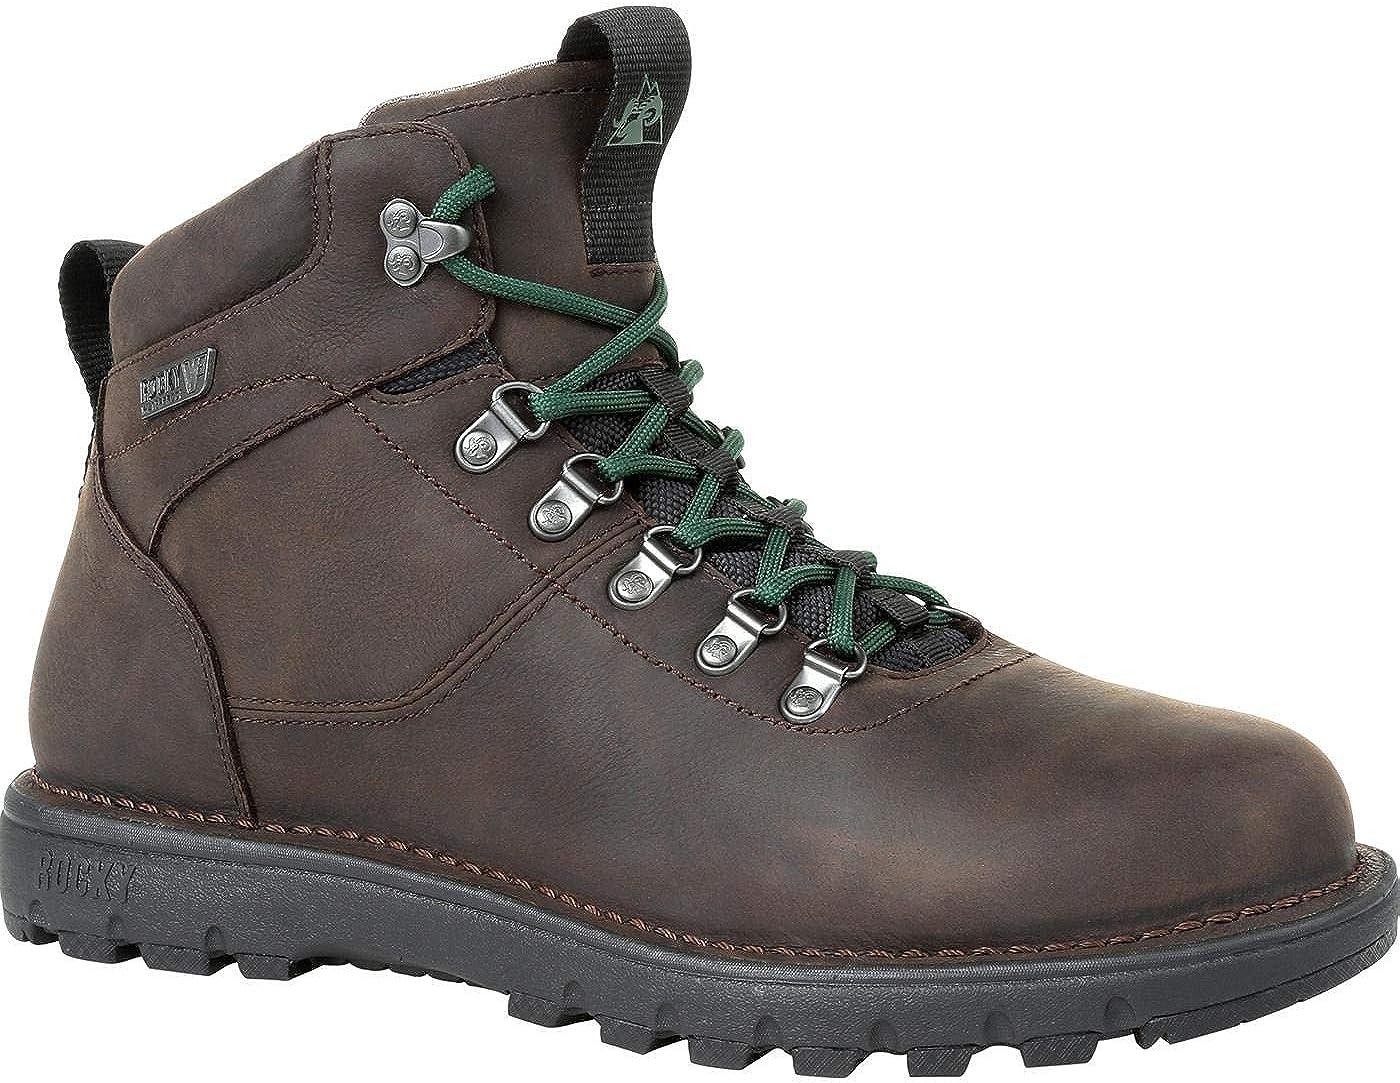 Rocky Legacy 32 Waterproof Outdoor Boot